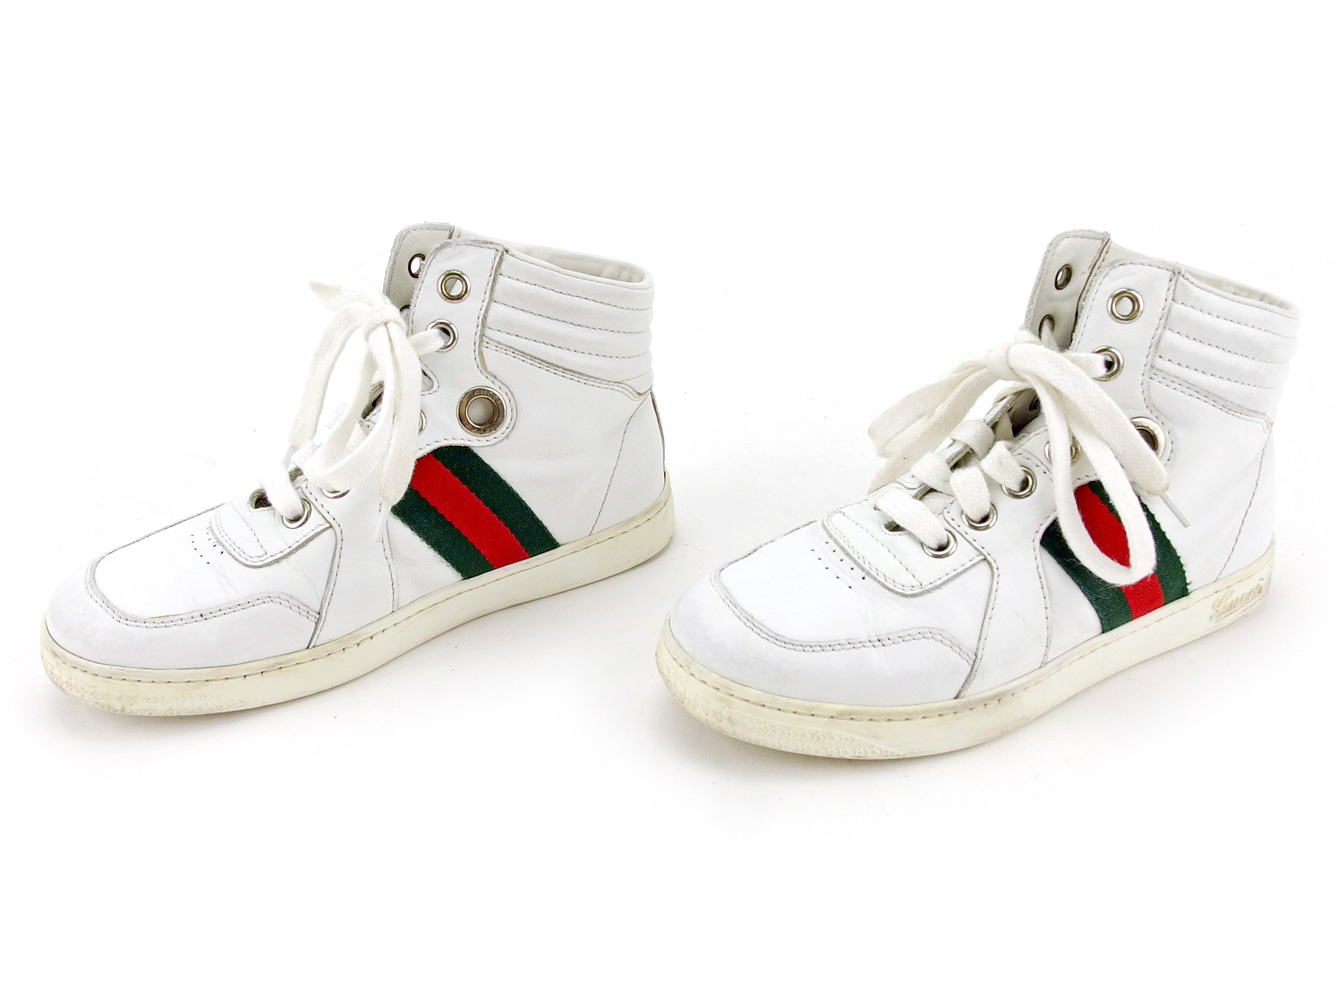 1c90bbf04 ... Gucci GUCCI sneakers shoes shoes girls Boys possible ♯ 30  ハイカットキッズウェビングラインホワイト X ...